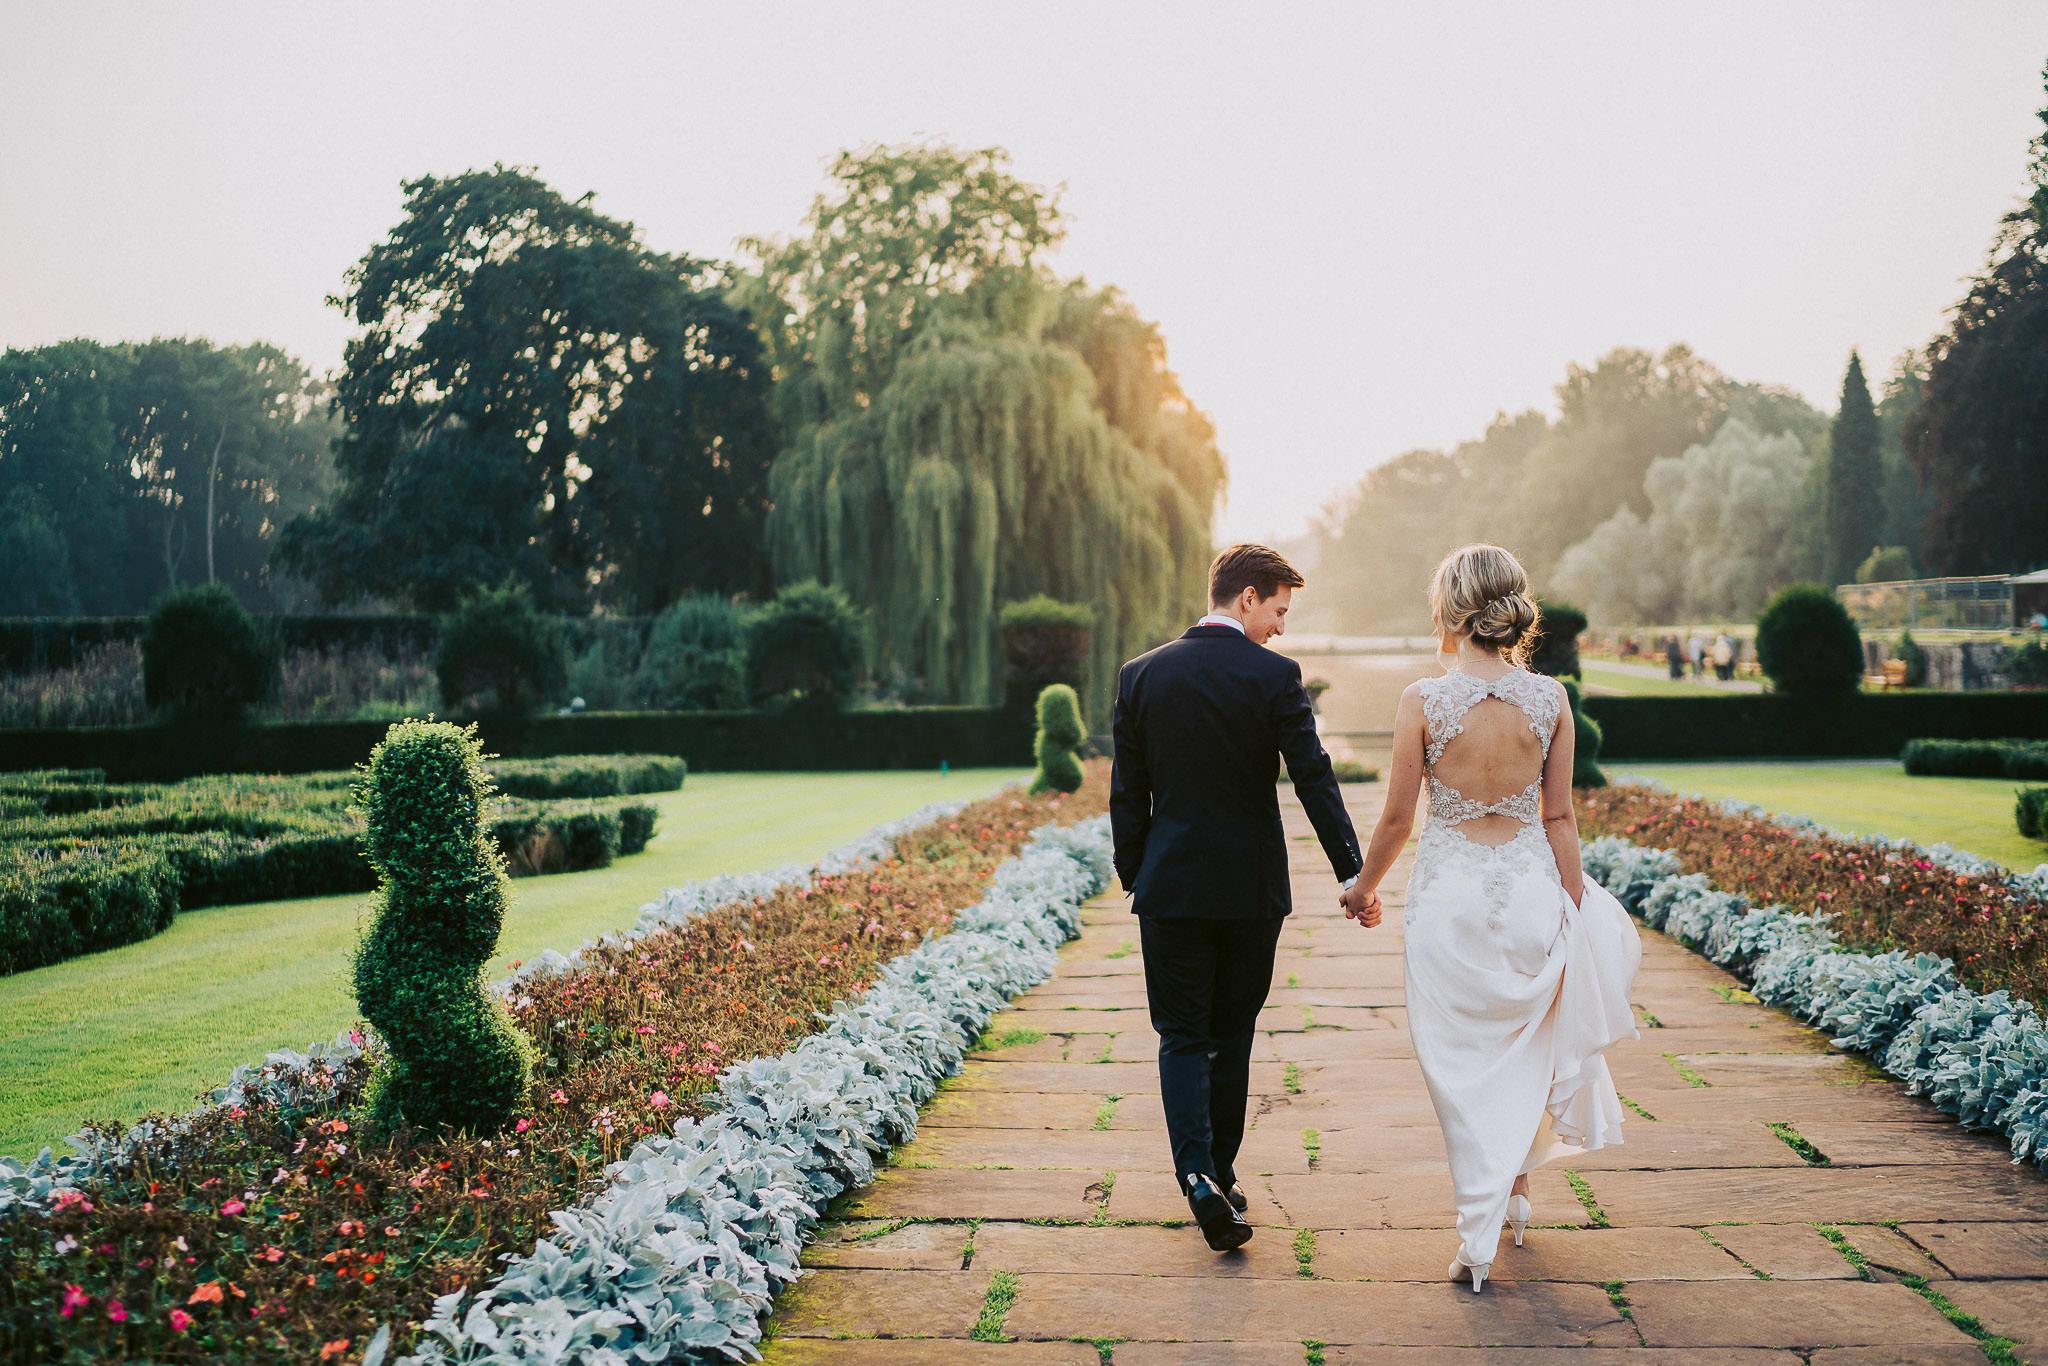 Staffordshire-Wedding-Photographer-101.jpg